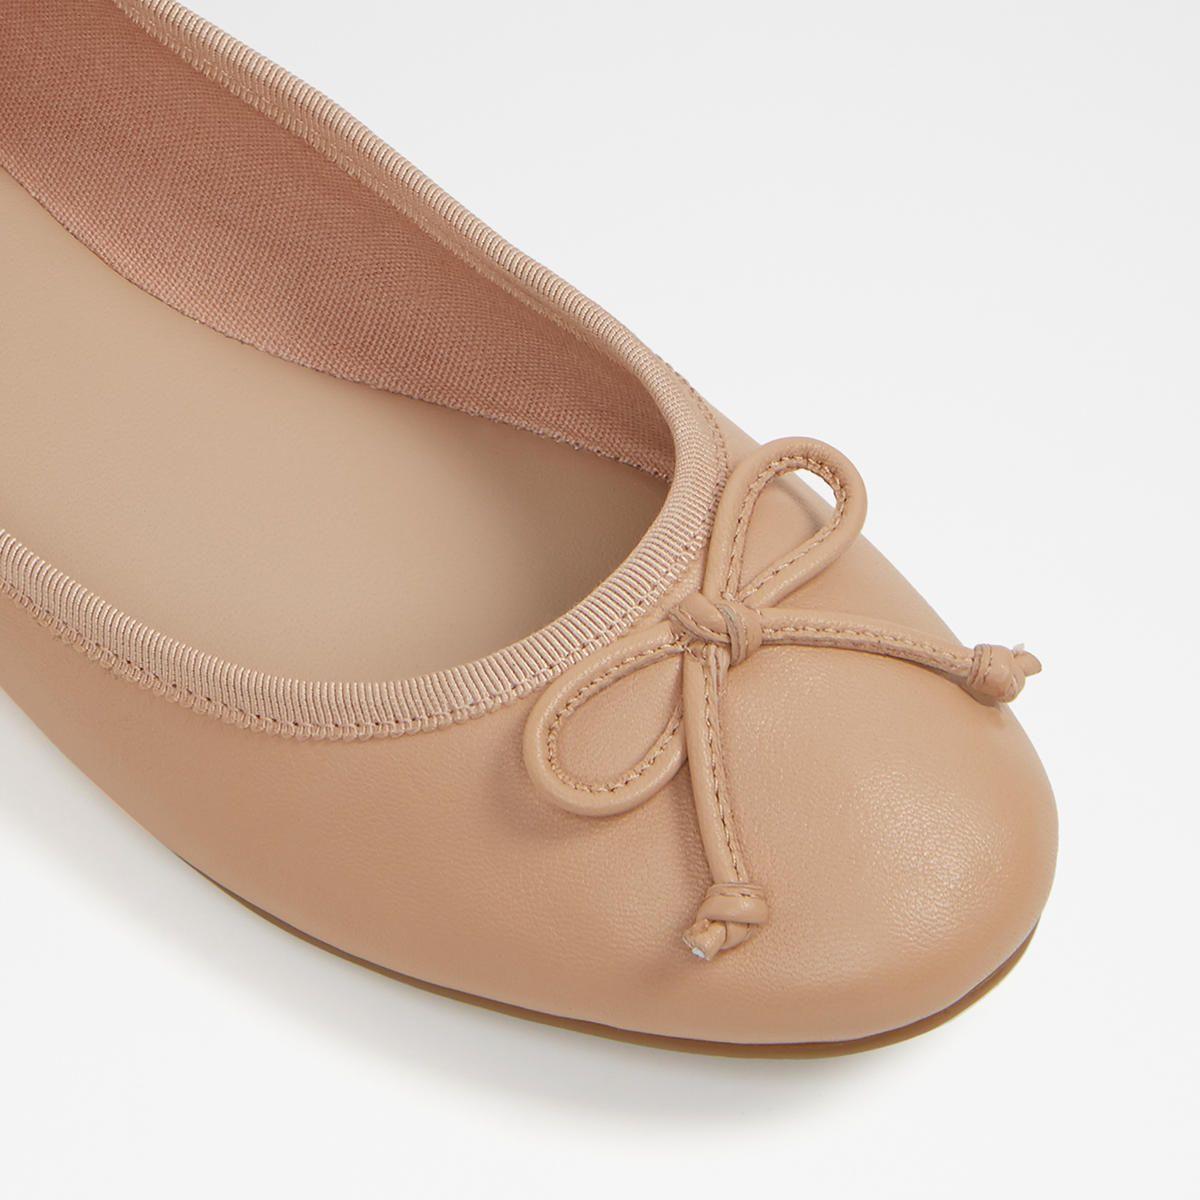 ec67d54db947 Aldo s Classic Nude Ballet Flats - Palinira Ballerinas